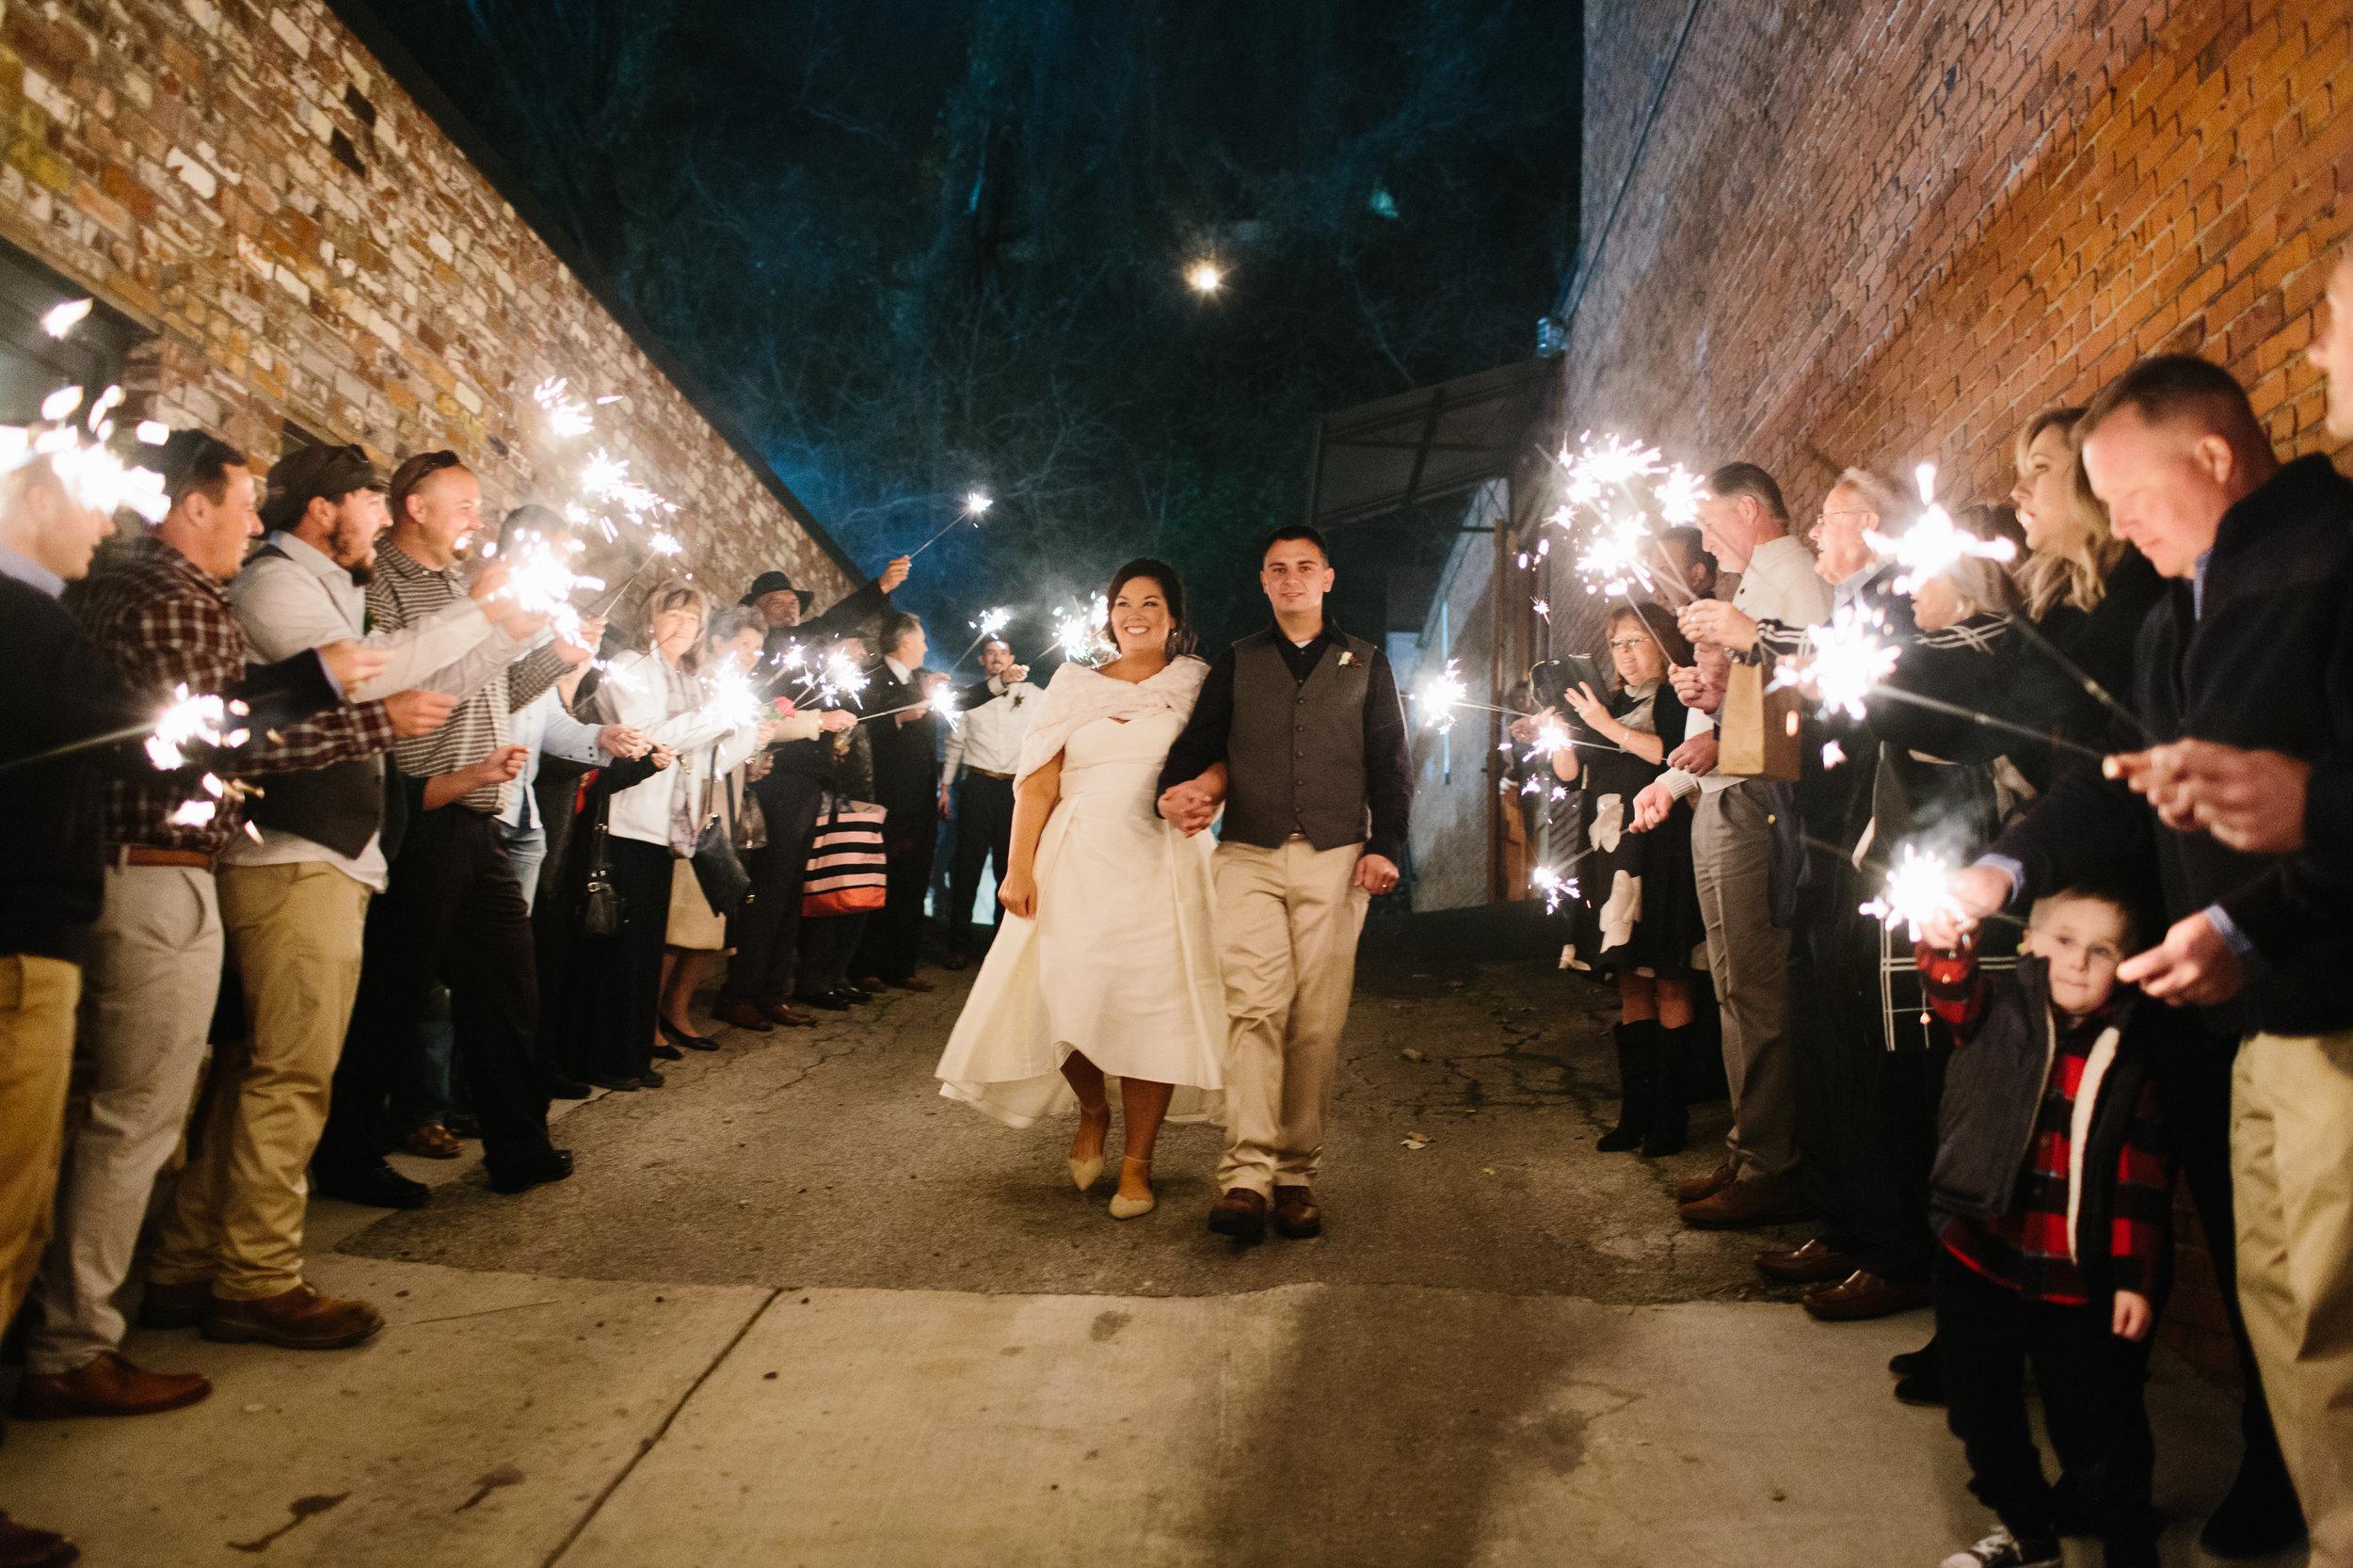 Lauren_Jeremy_Standard_Wedding_Knoxville_Abigail_Malone_Photography_FIlm-611.jpg